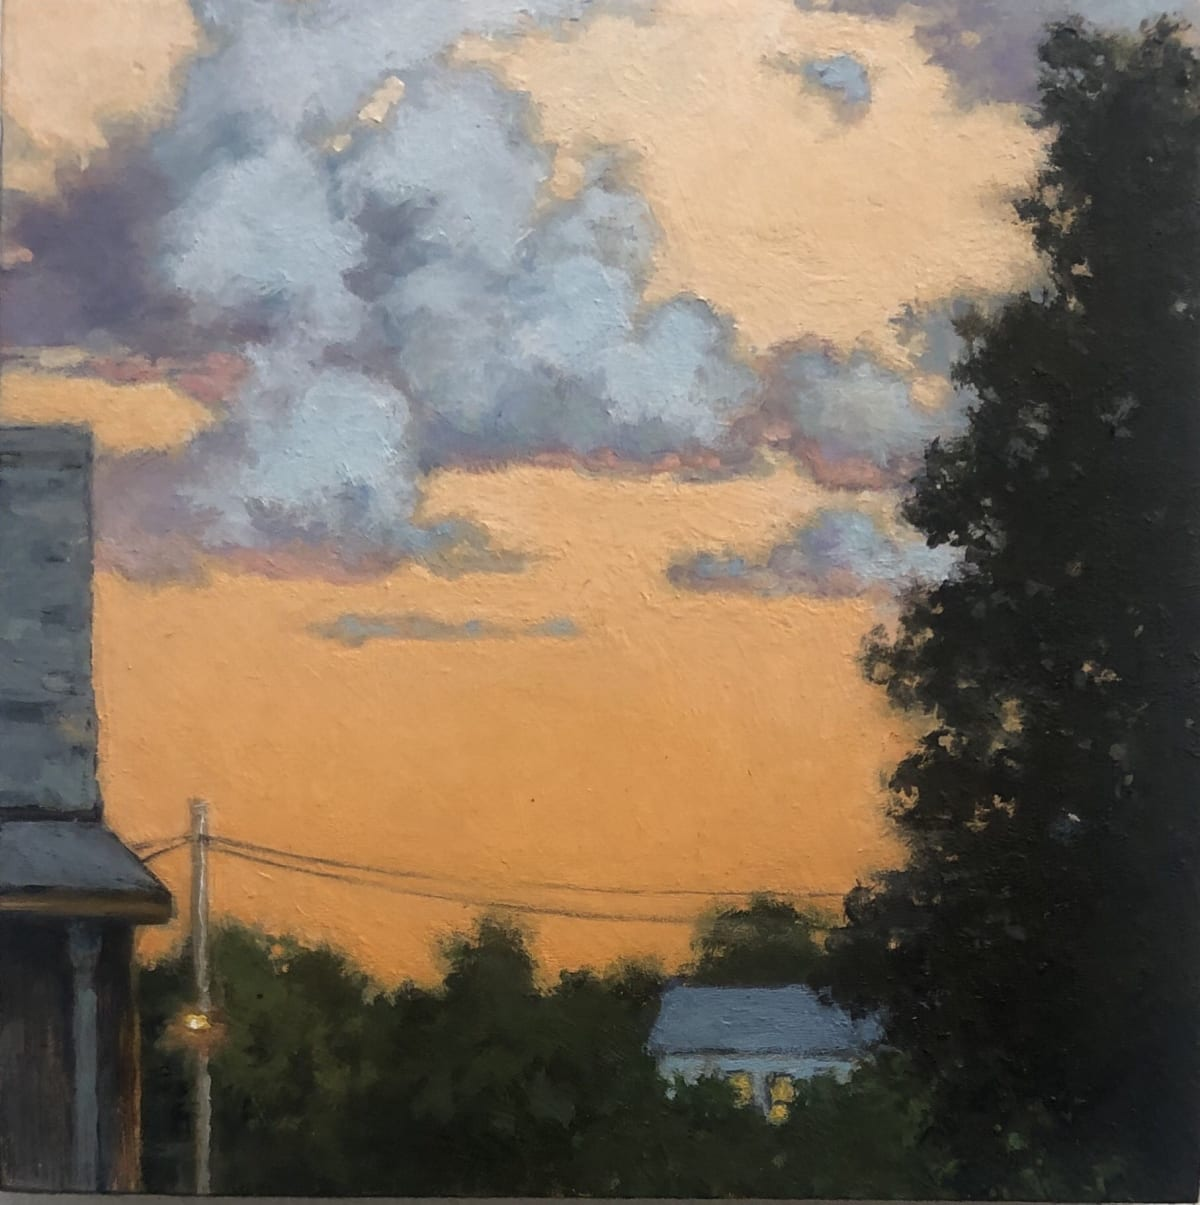 Sally Maca, Arbor Vitae, 2019